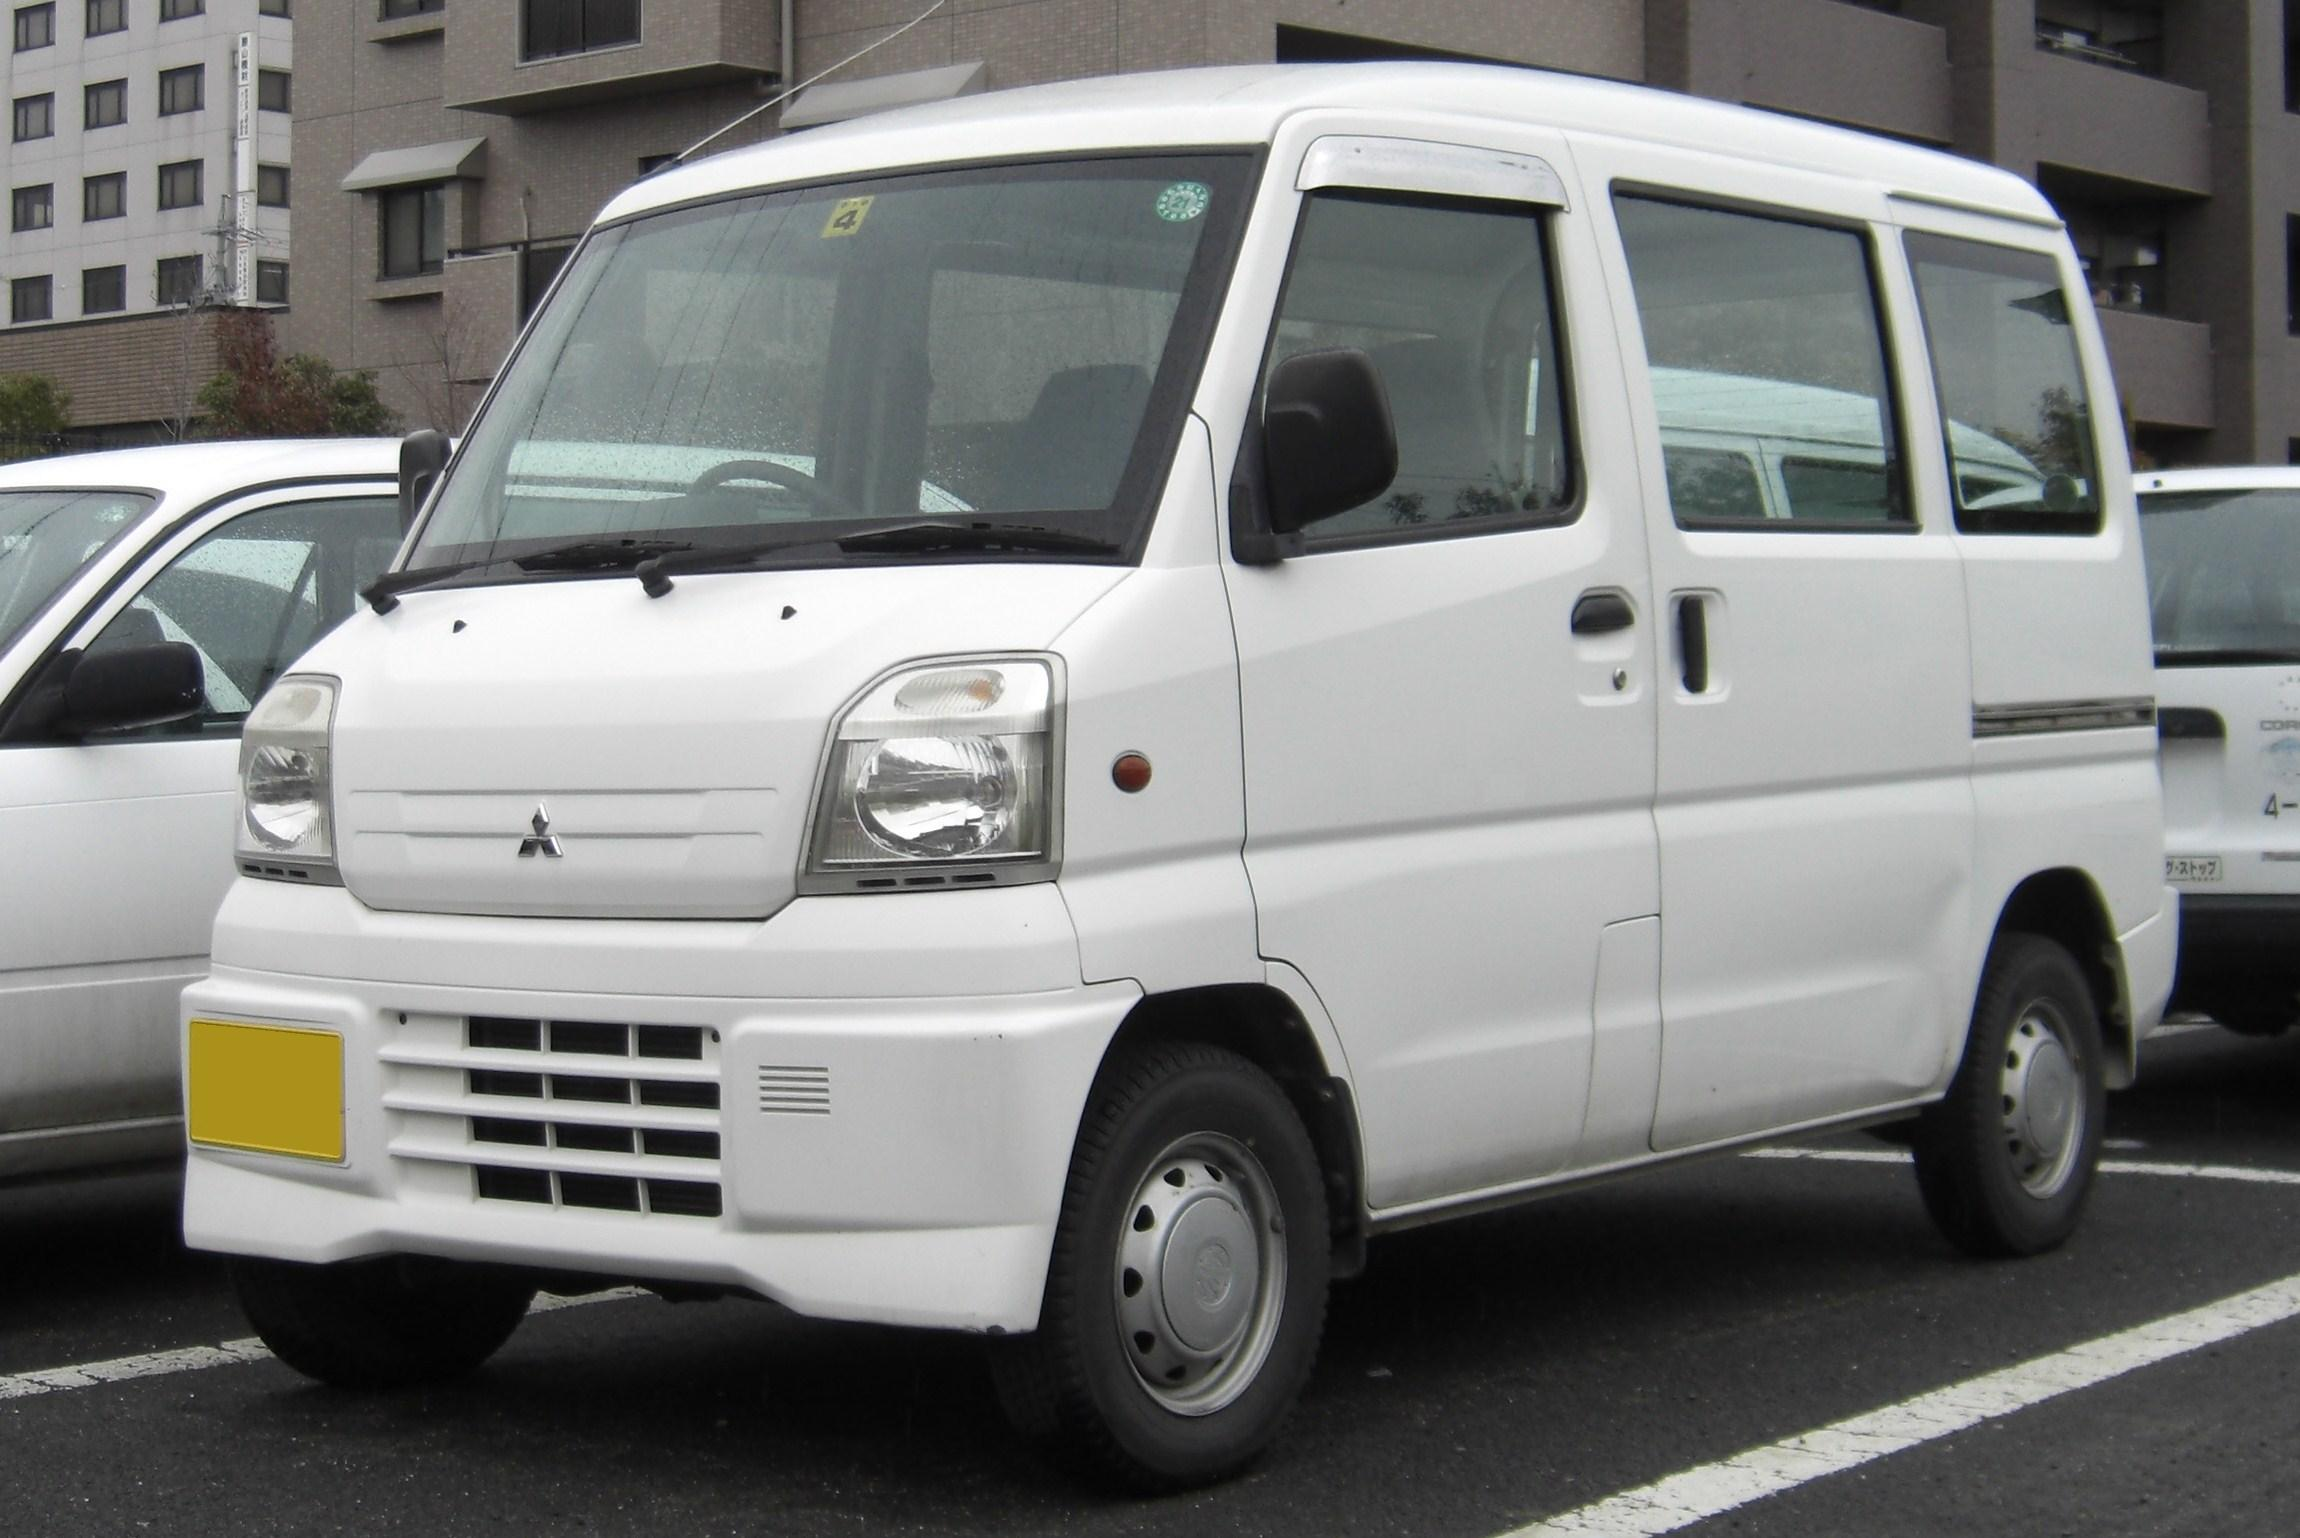 mitsubishi minicab wikipedia rh en wikipedia org 2002 Mitsubishi Galant Fuse Diagram 2007 Mitsubishi Galant Fuse Diagram